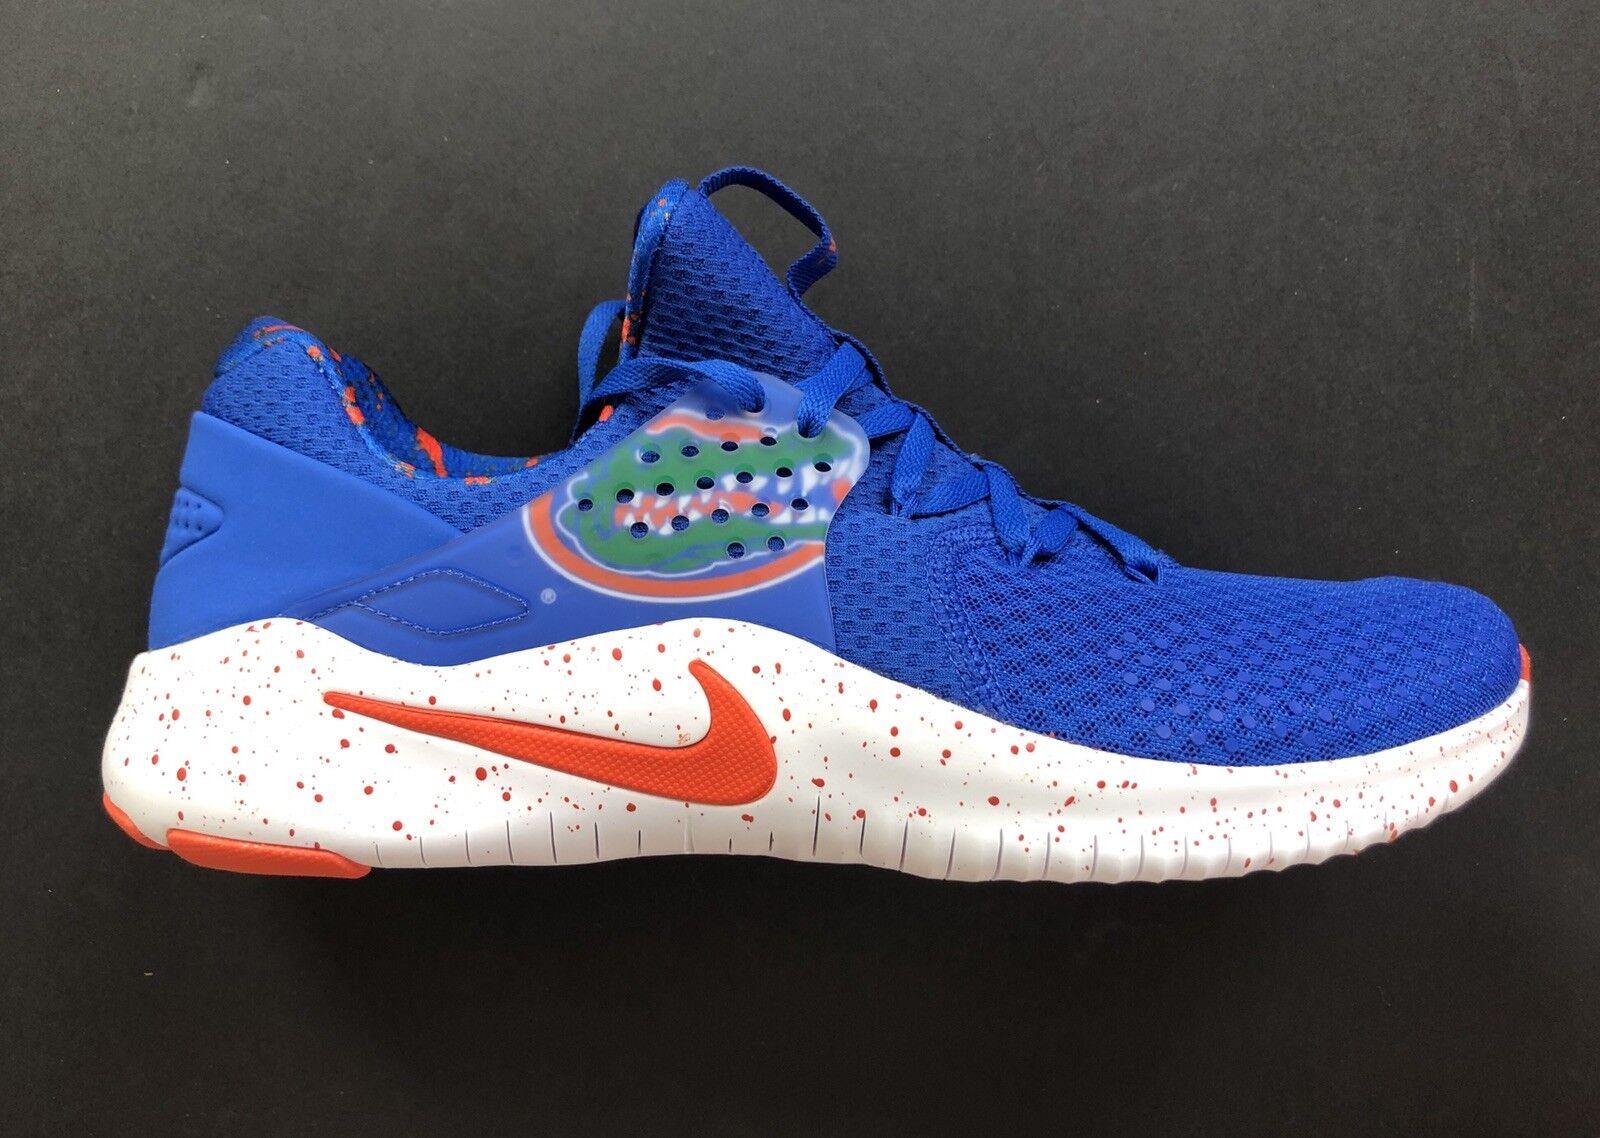 Nike Florida Gators Free TR 8 College shoes Game Royal AR0417-400 Size 10.5